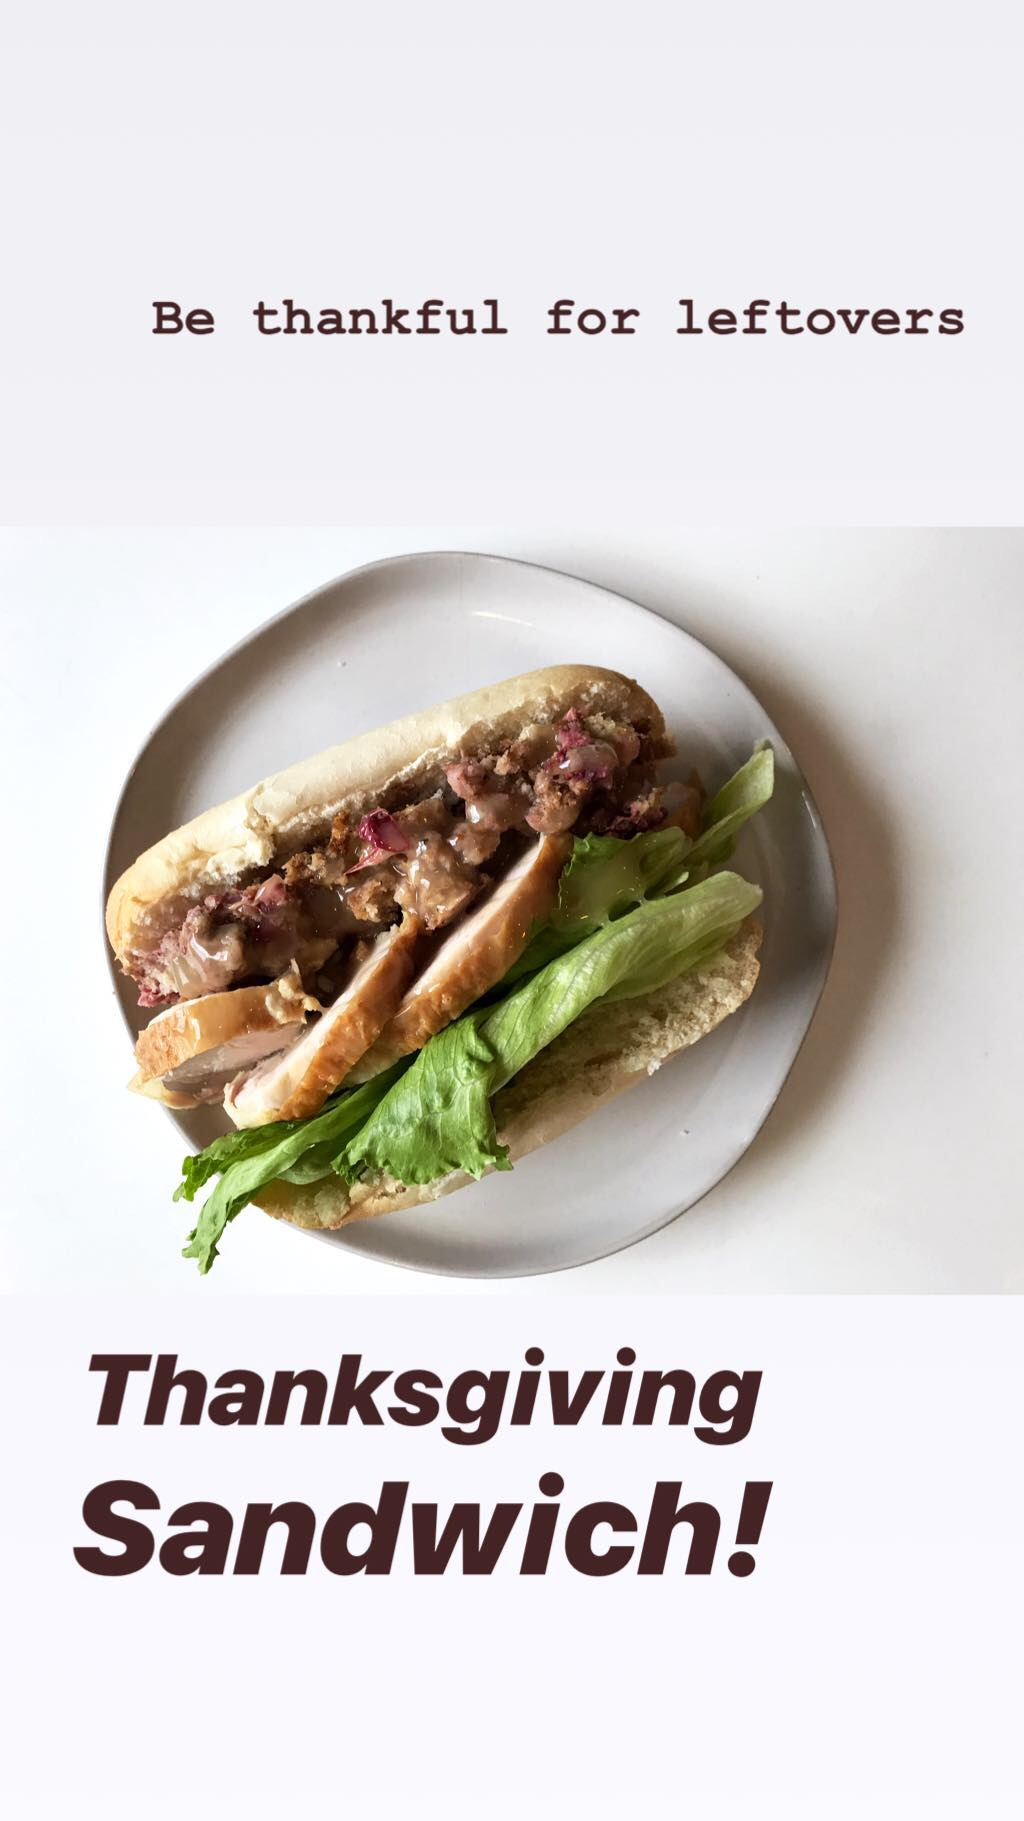 The Thanksgiving Sandwich